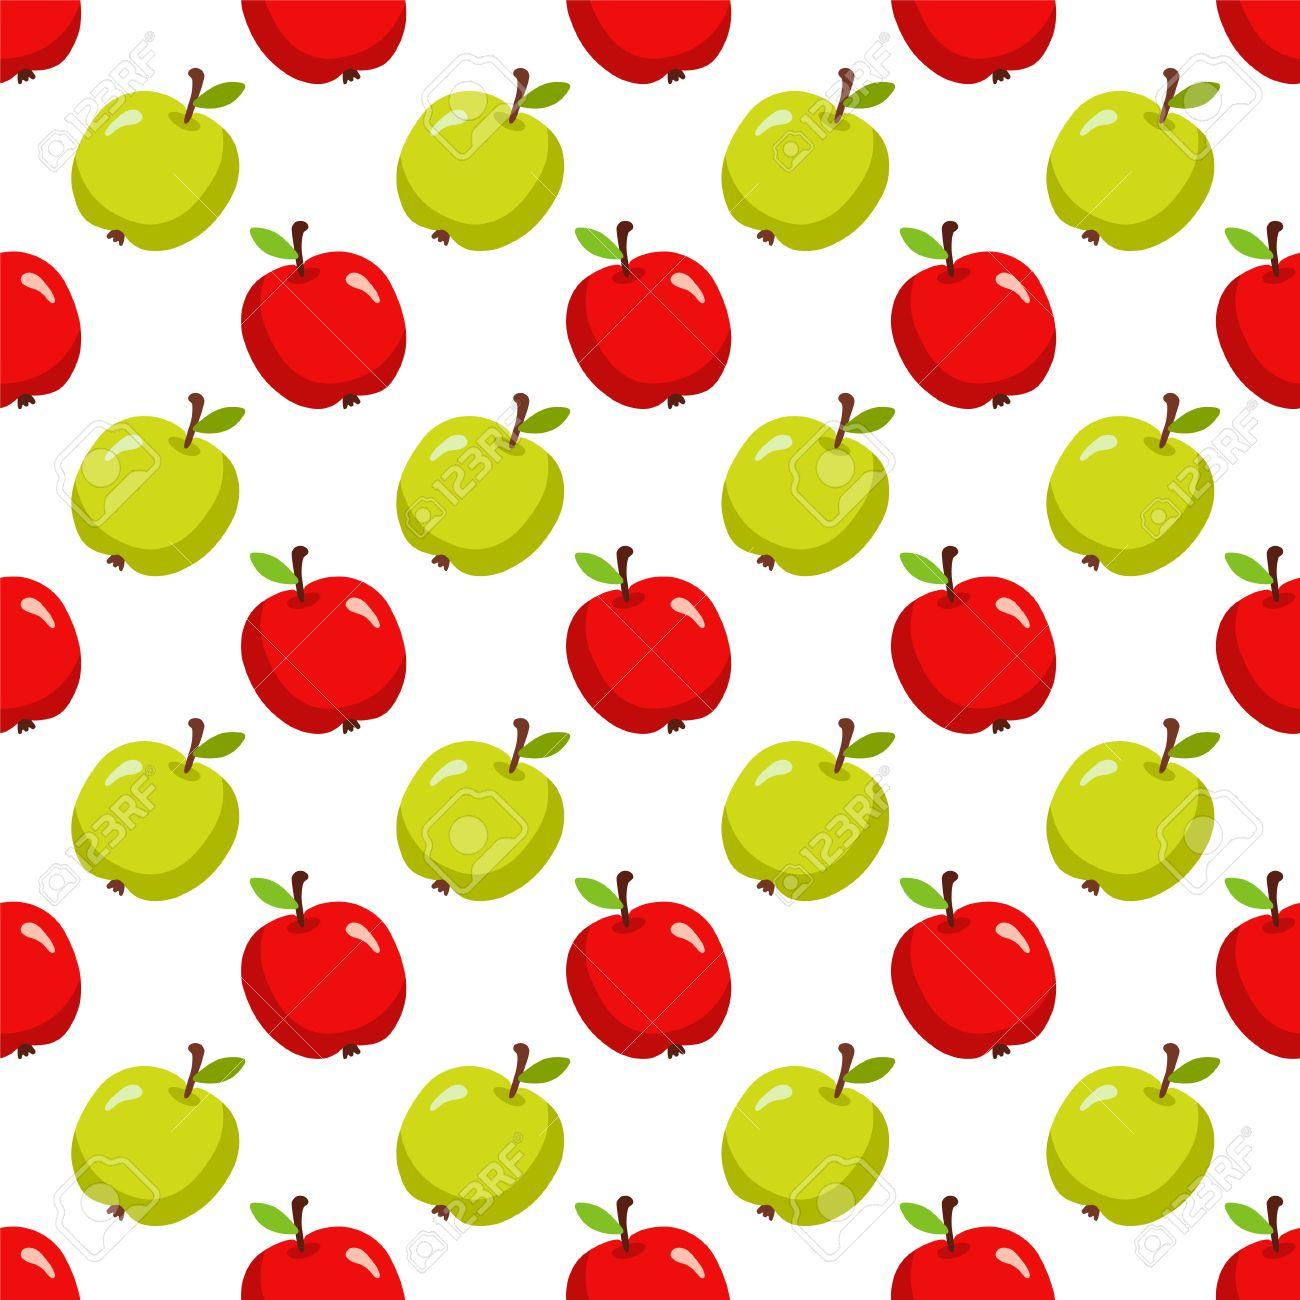 Download 3000+ Wallpaper Apple Cartoon  Paling Baru